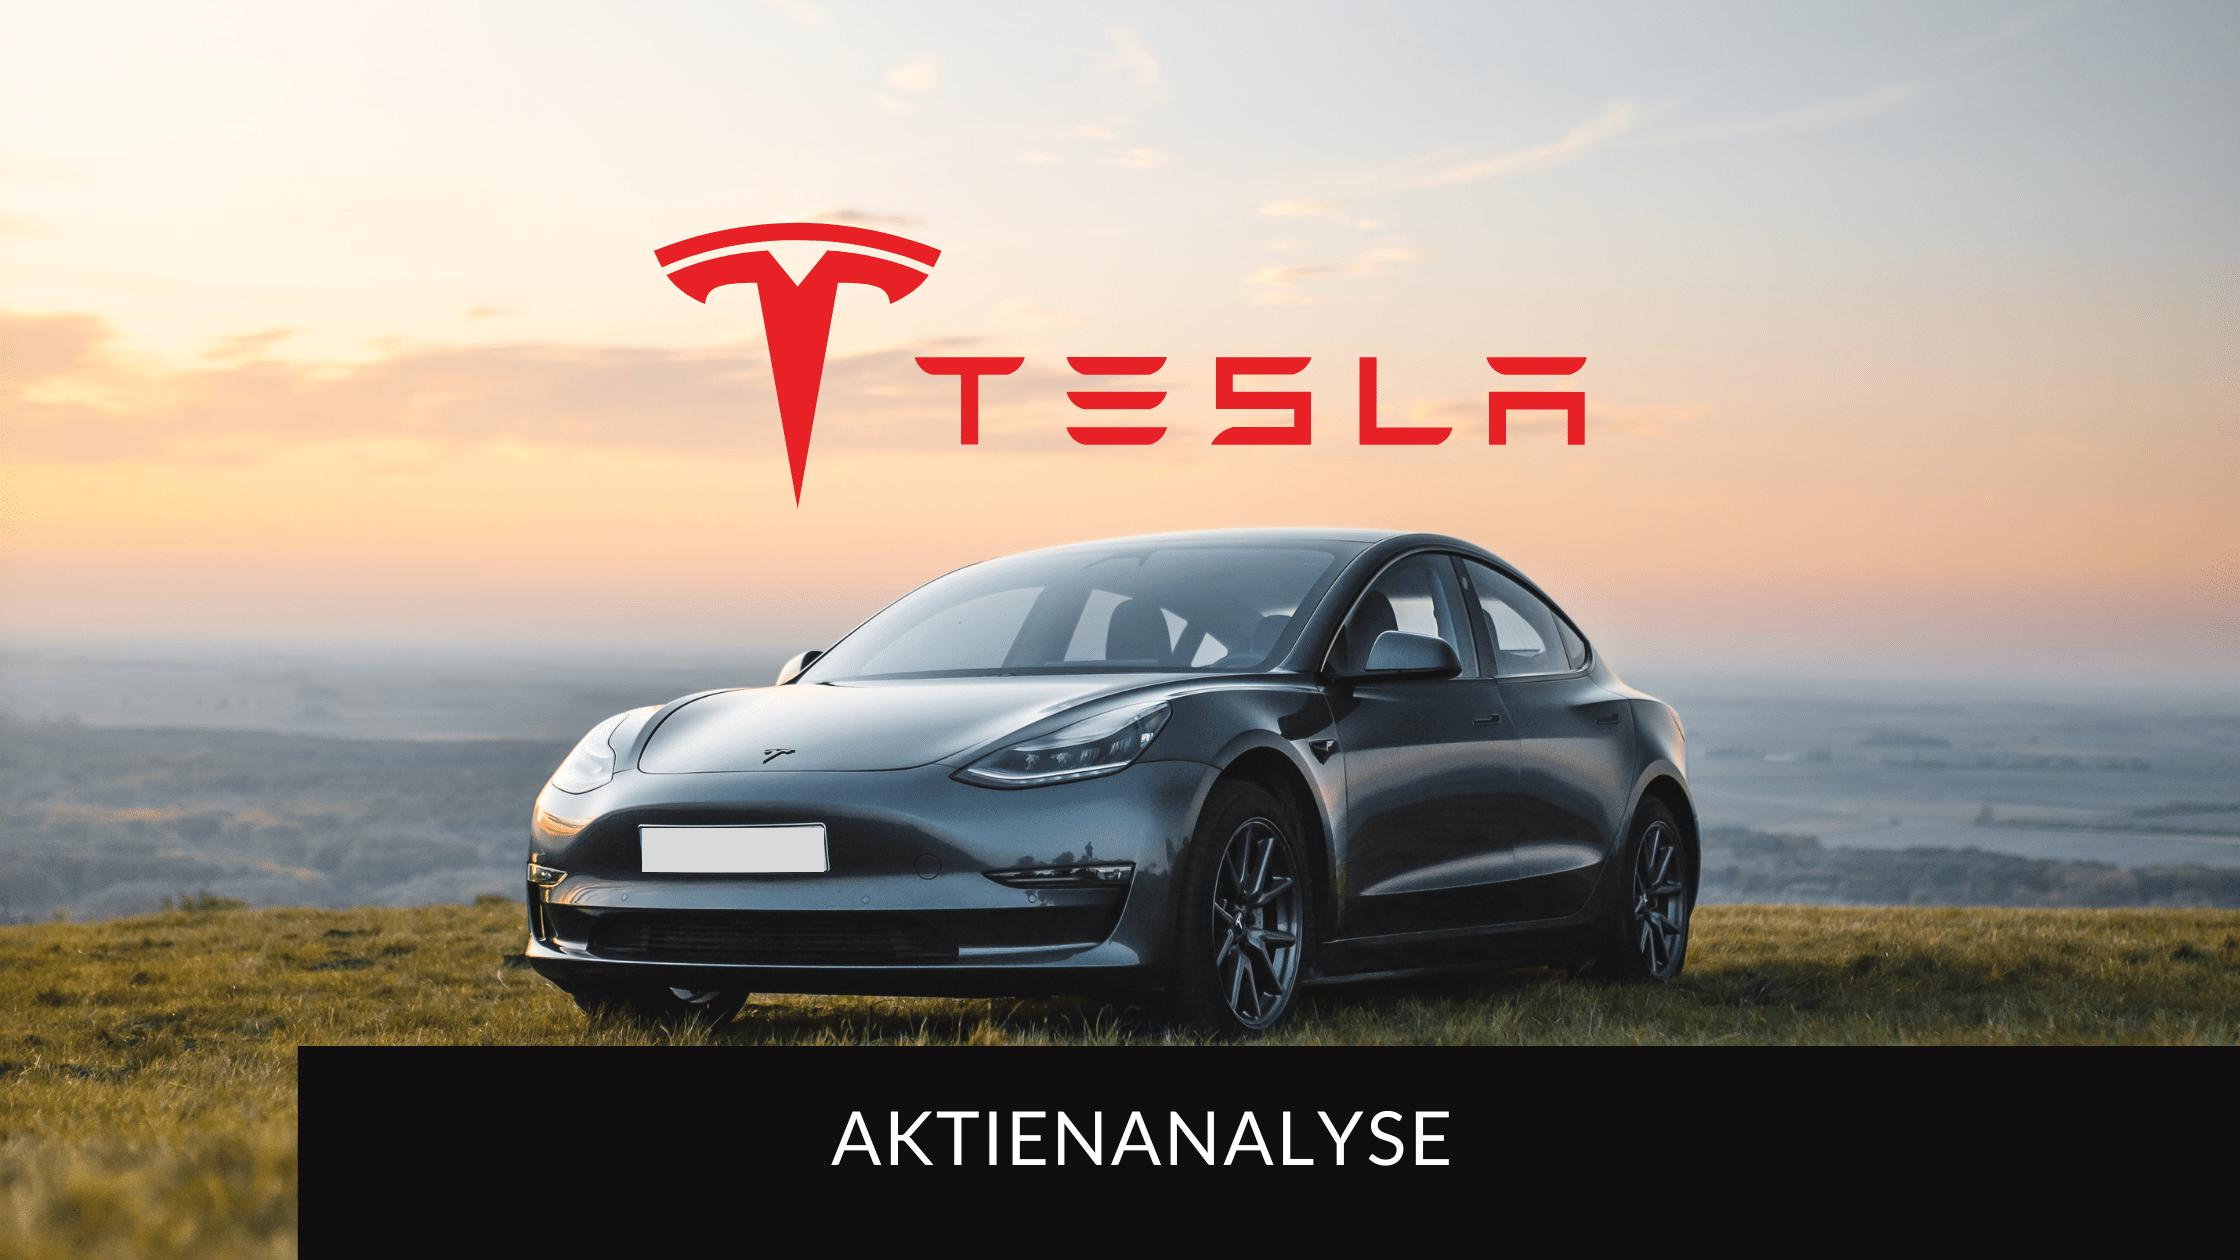 Tesla Aktienanalyse